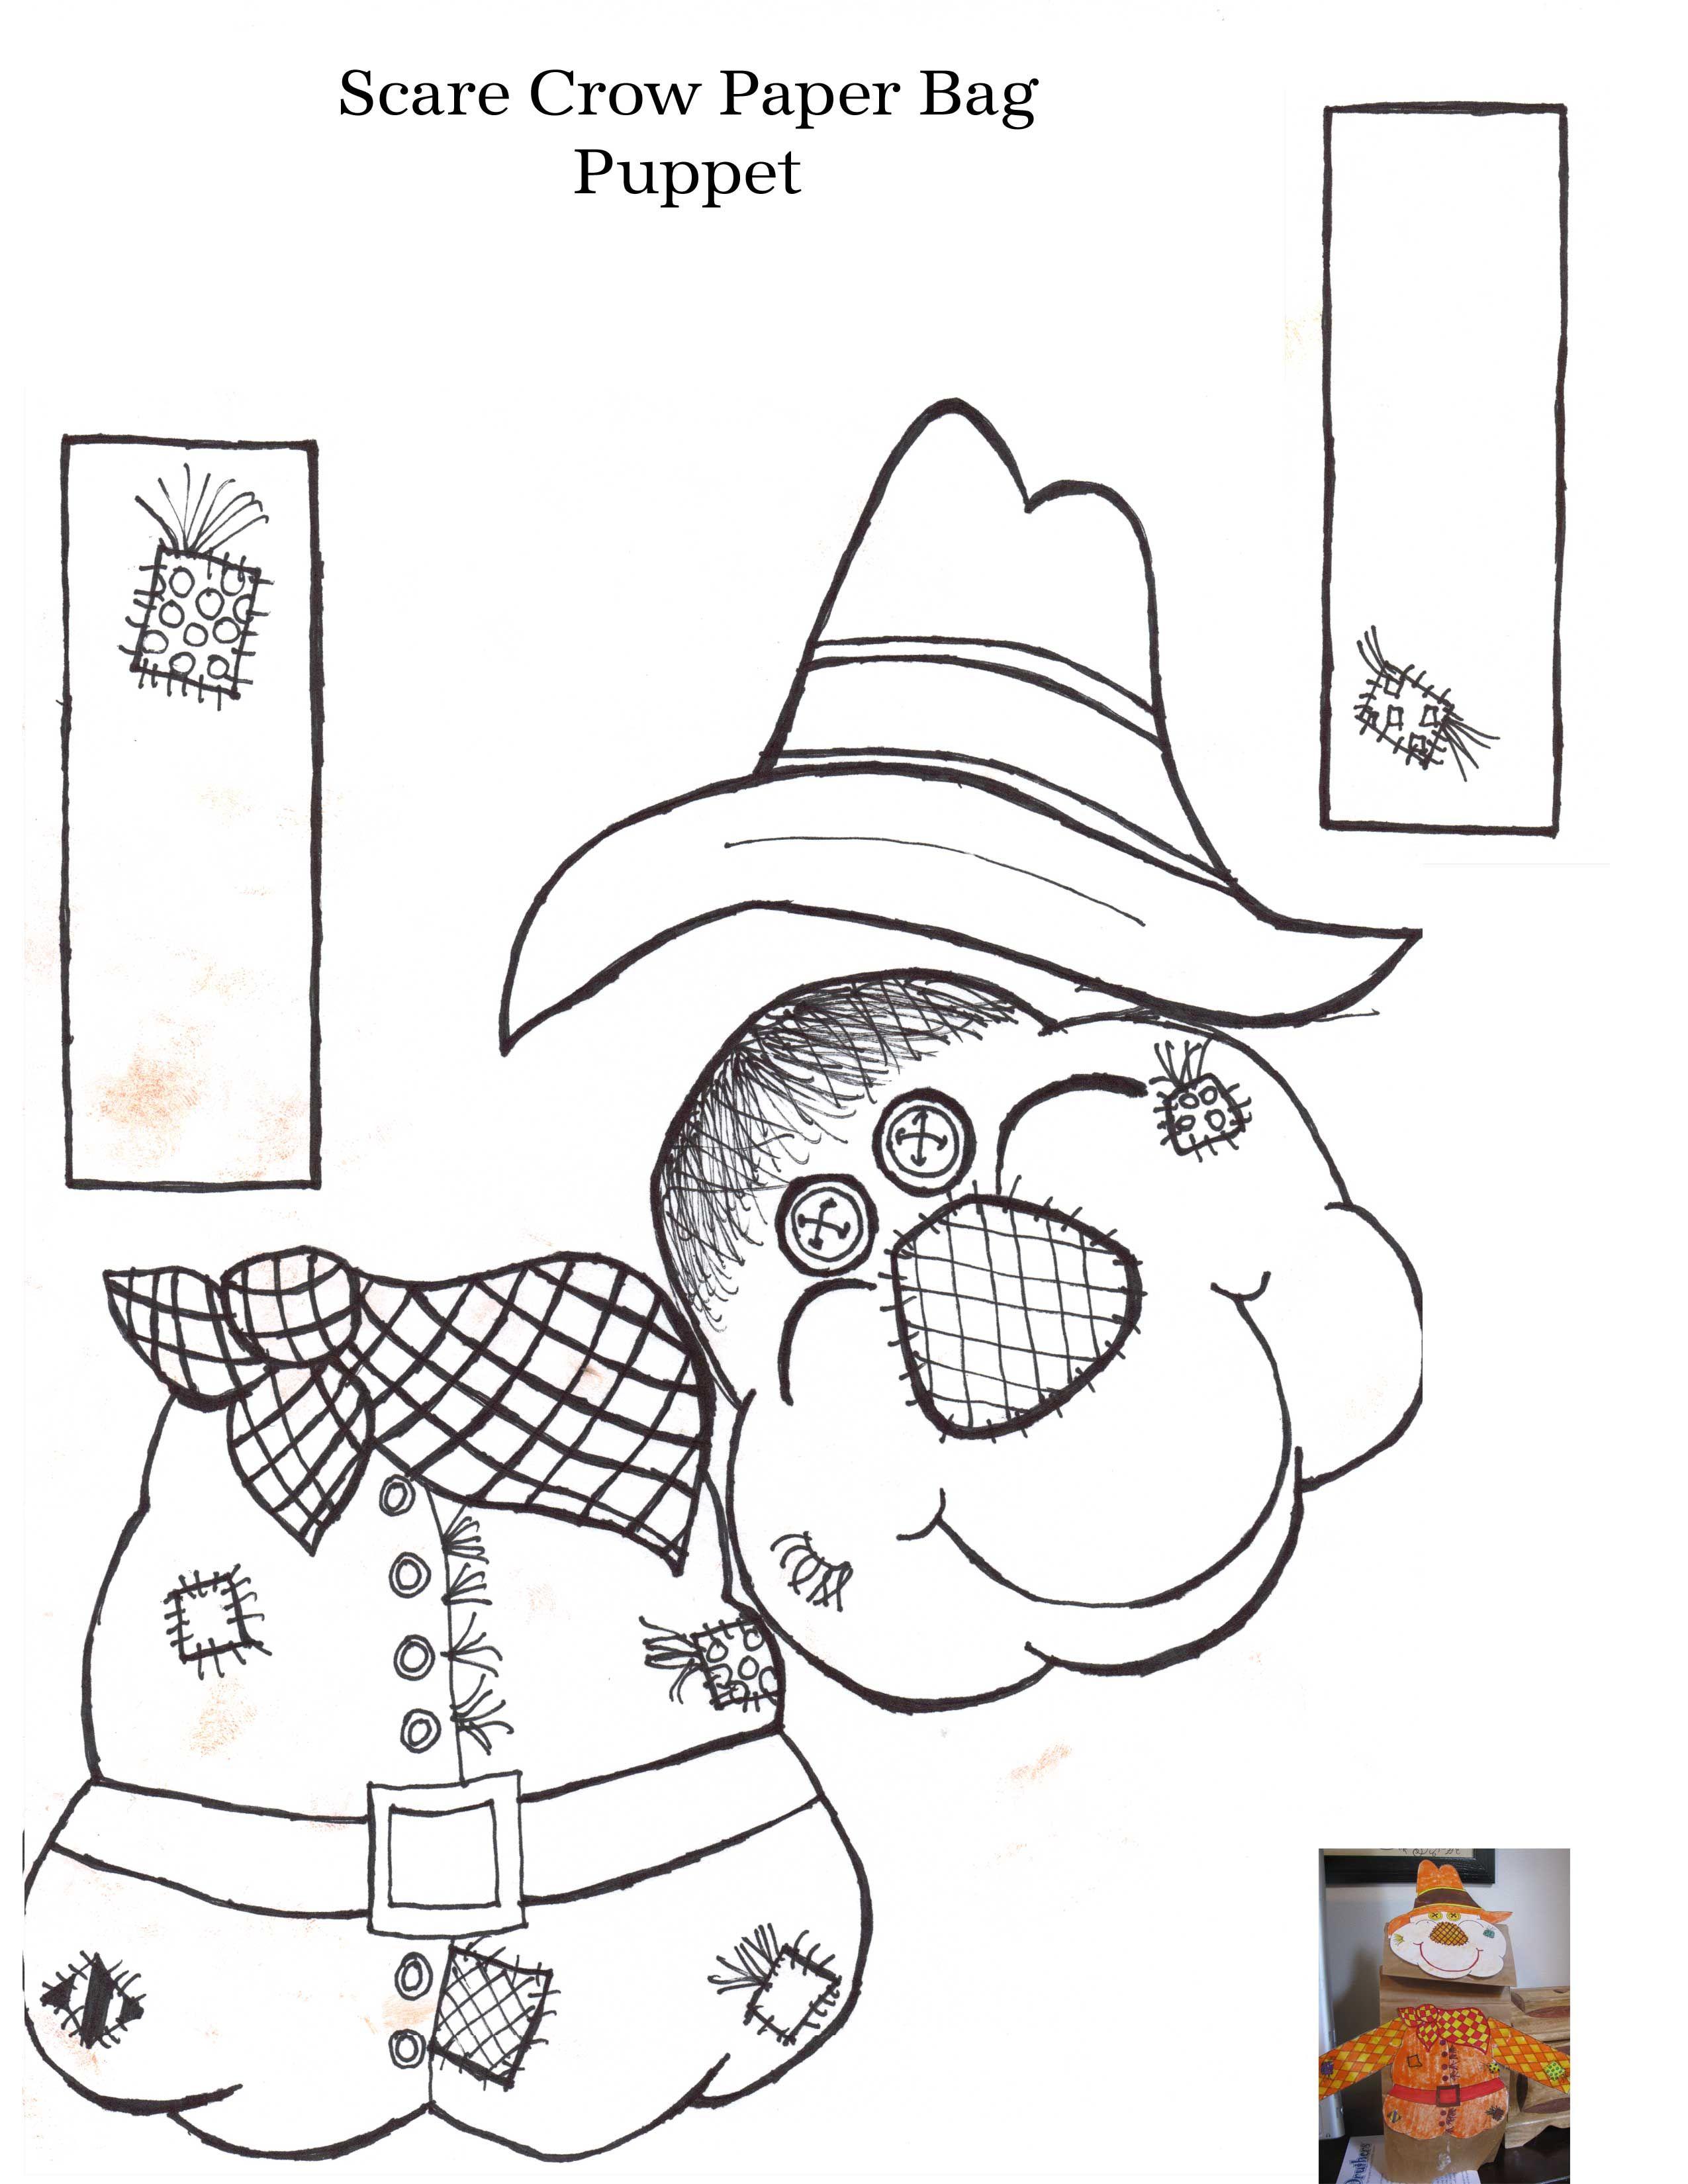 scarecrow+crafts   Scarecrow Crafts For Preschool   Autumn ...